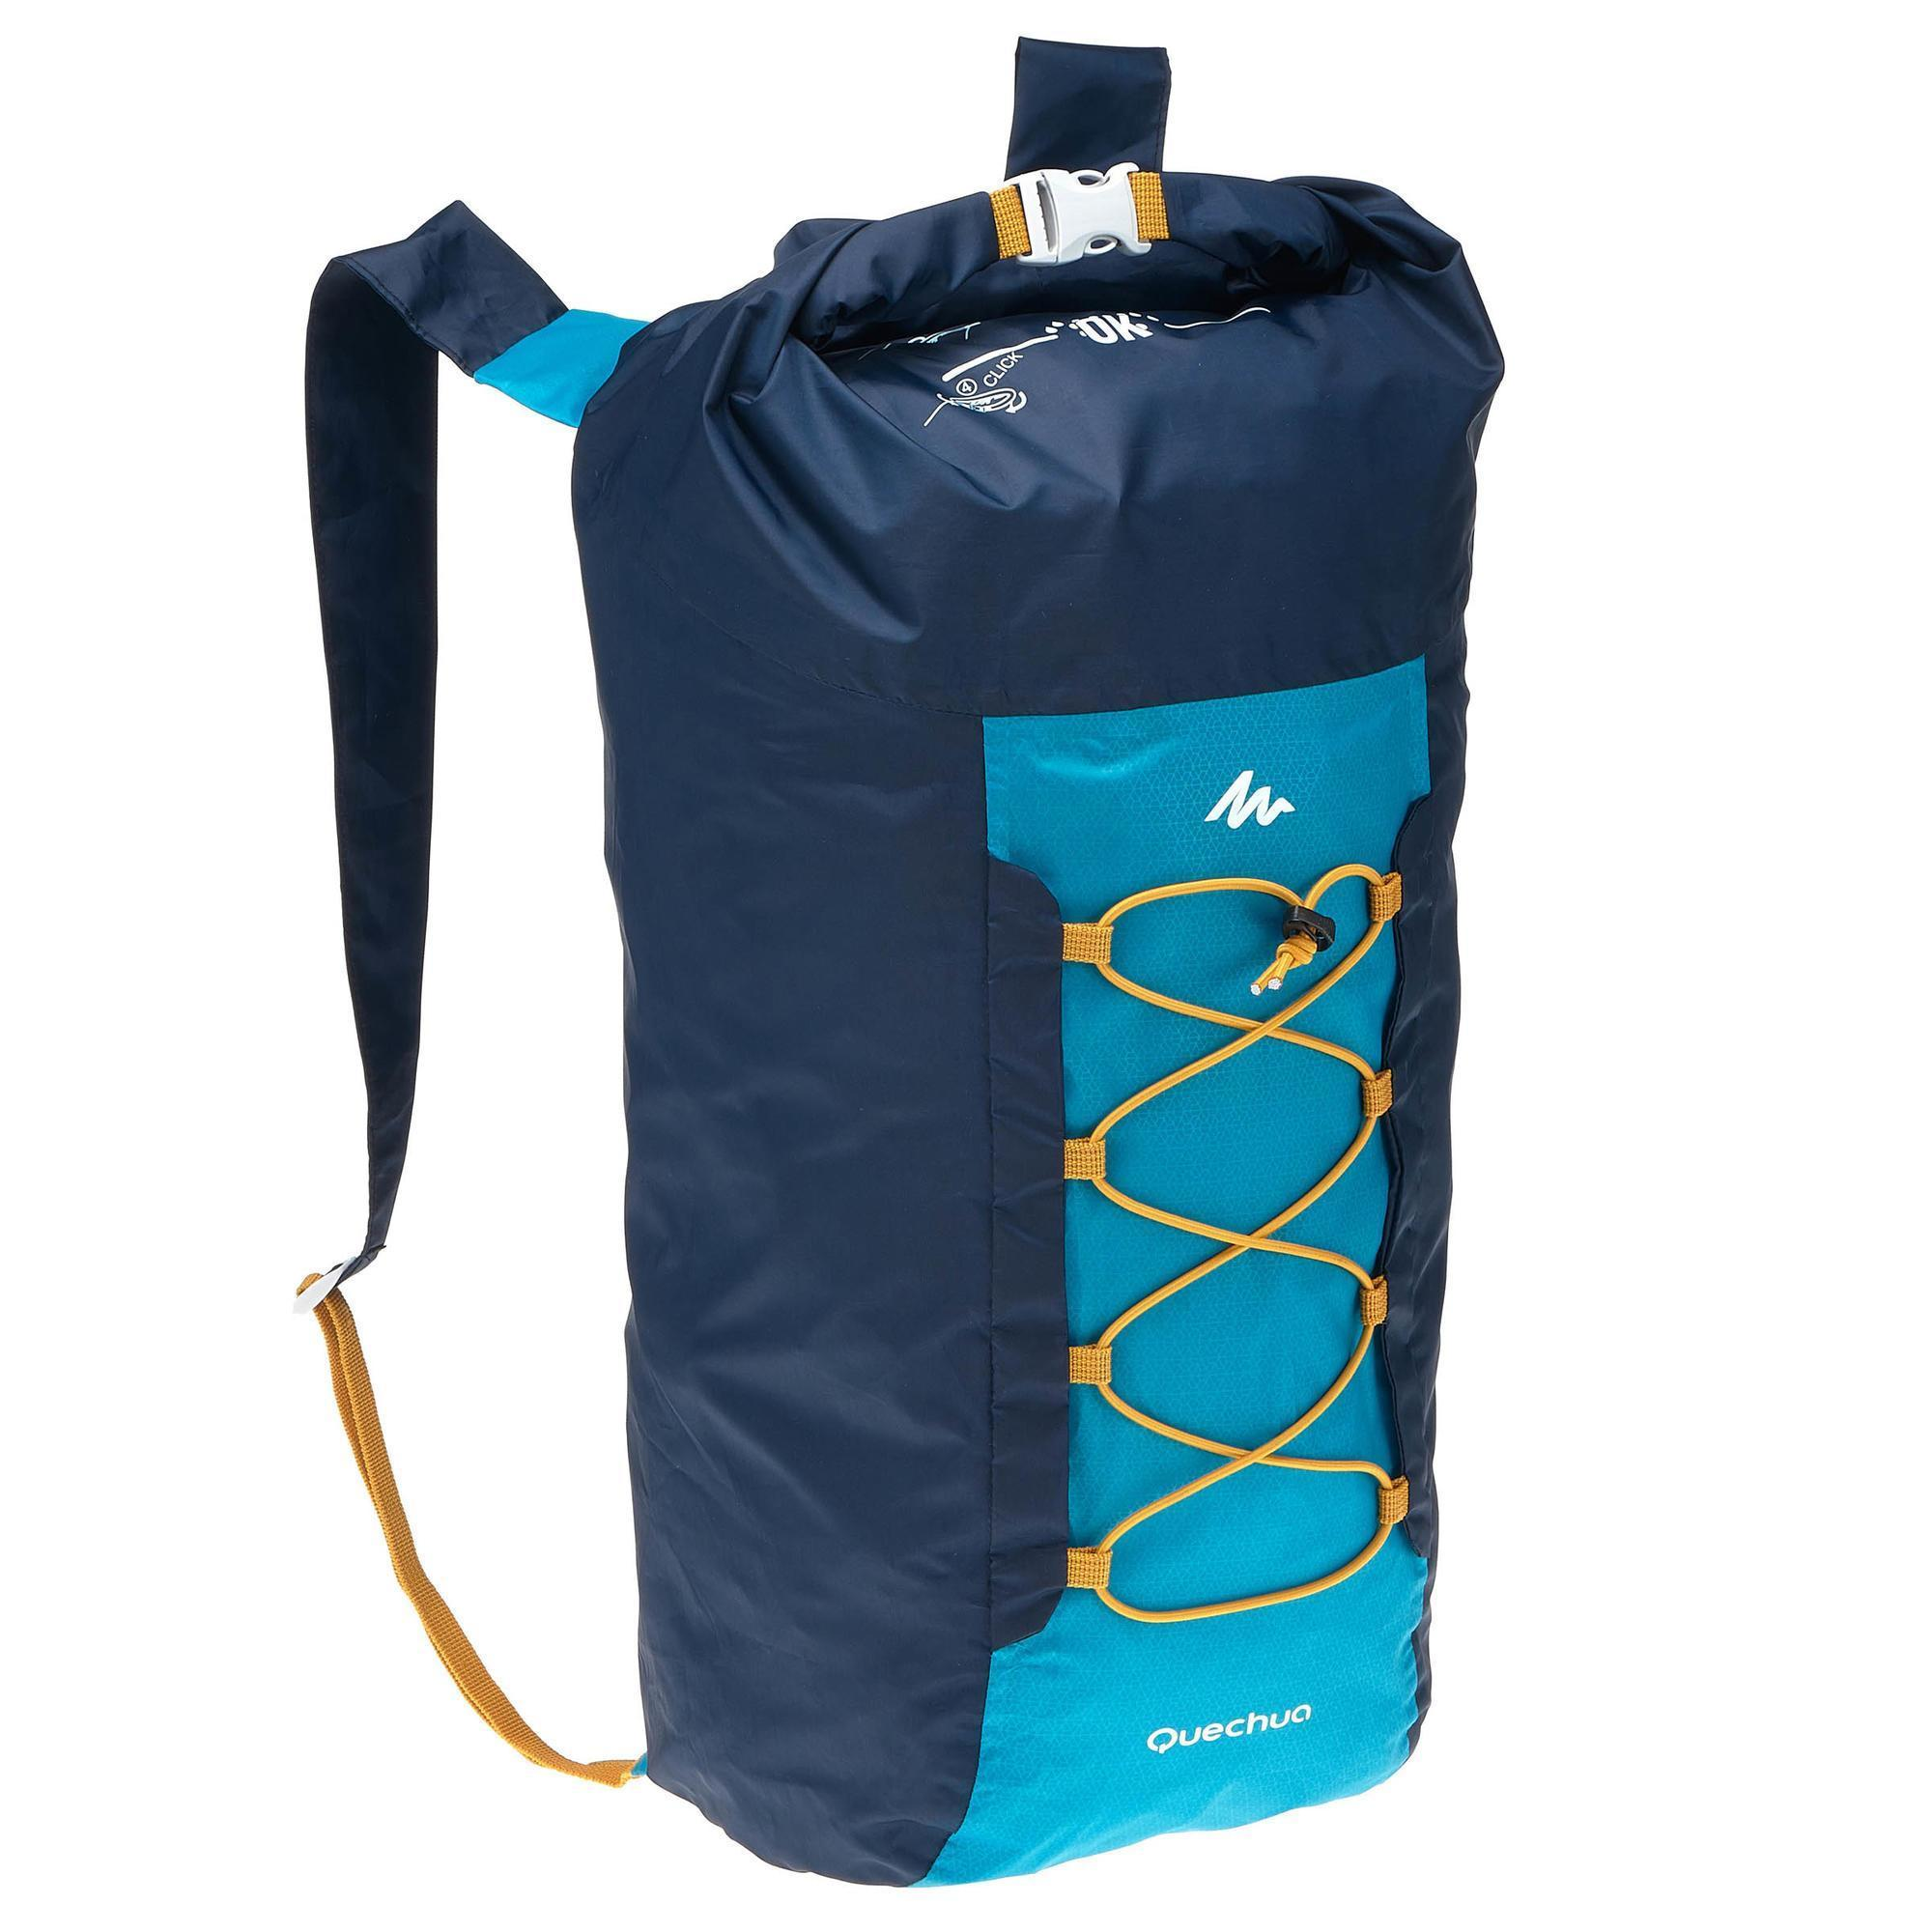 sac dos d 39 appoint ultra compact 20 litres imperm able bleu quechua. Black Bedroom Furniture Sets. Home Design Ideas